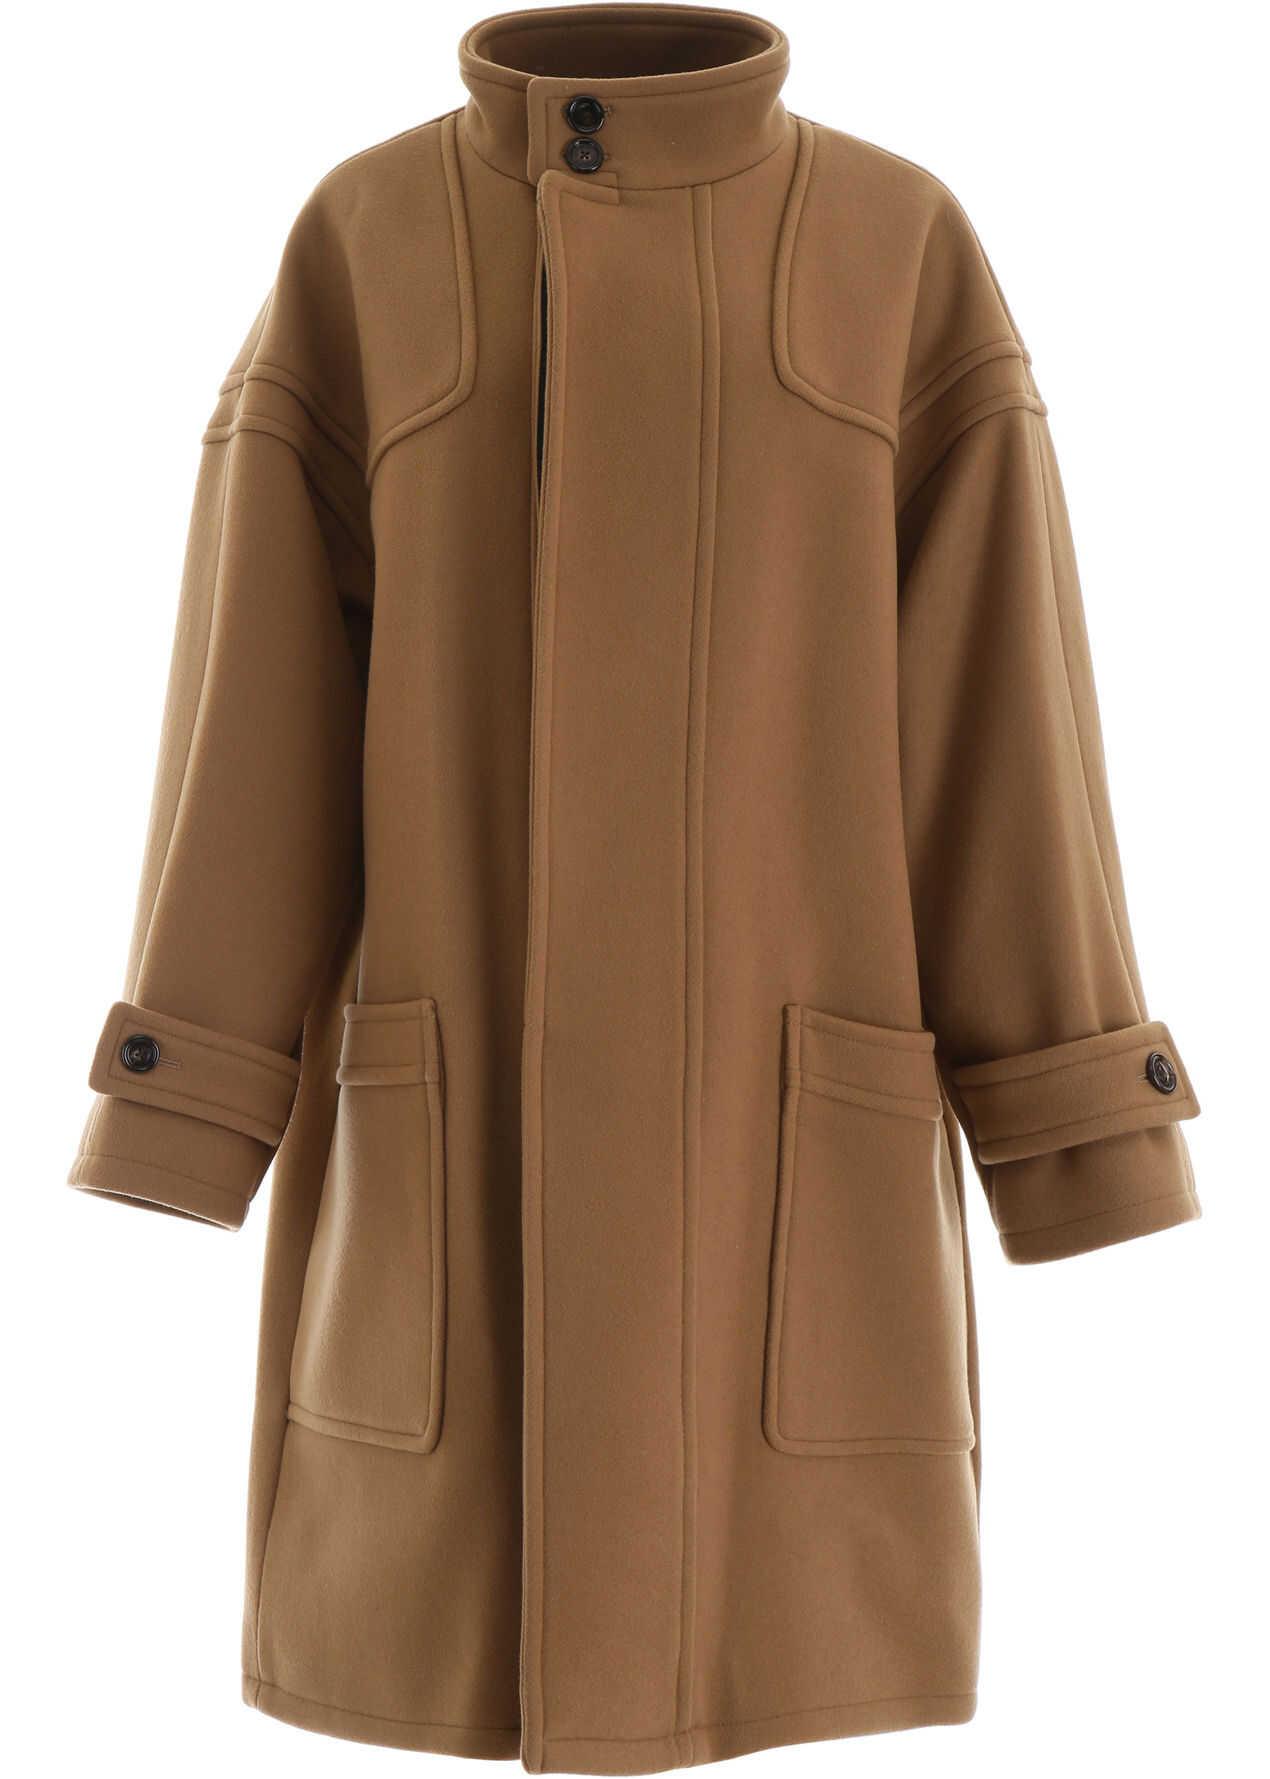 Céline Wool Coat CAMEL